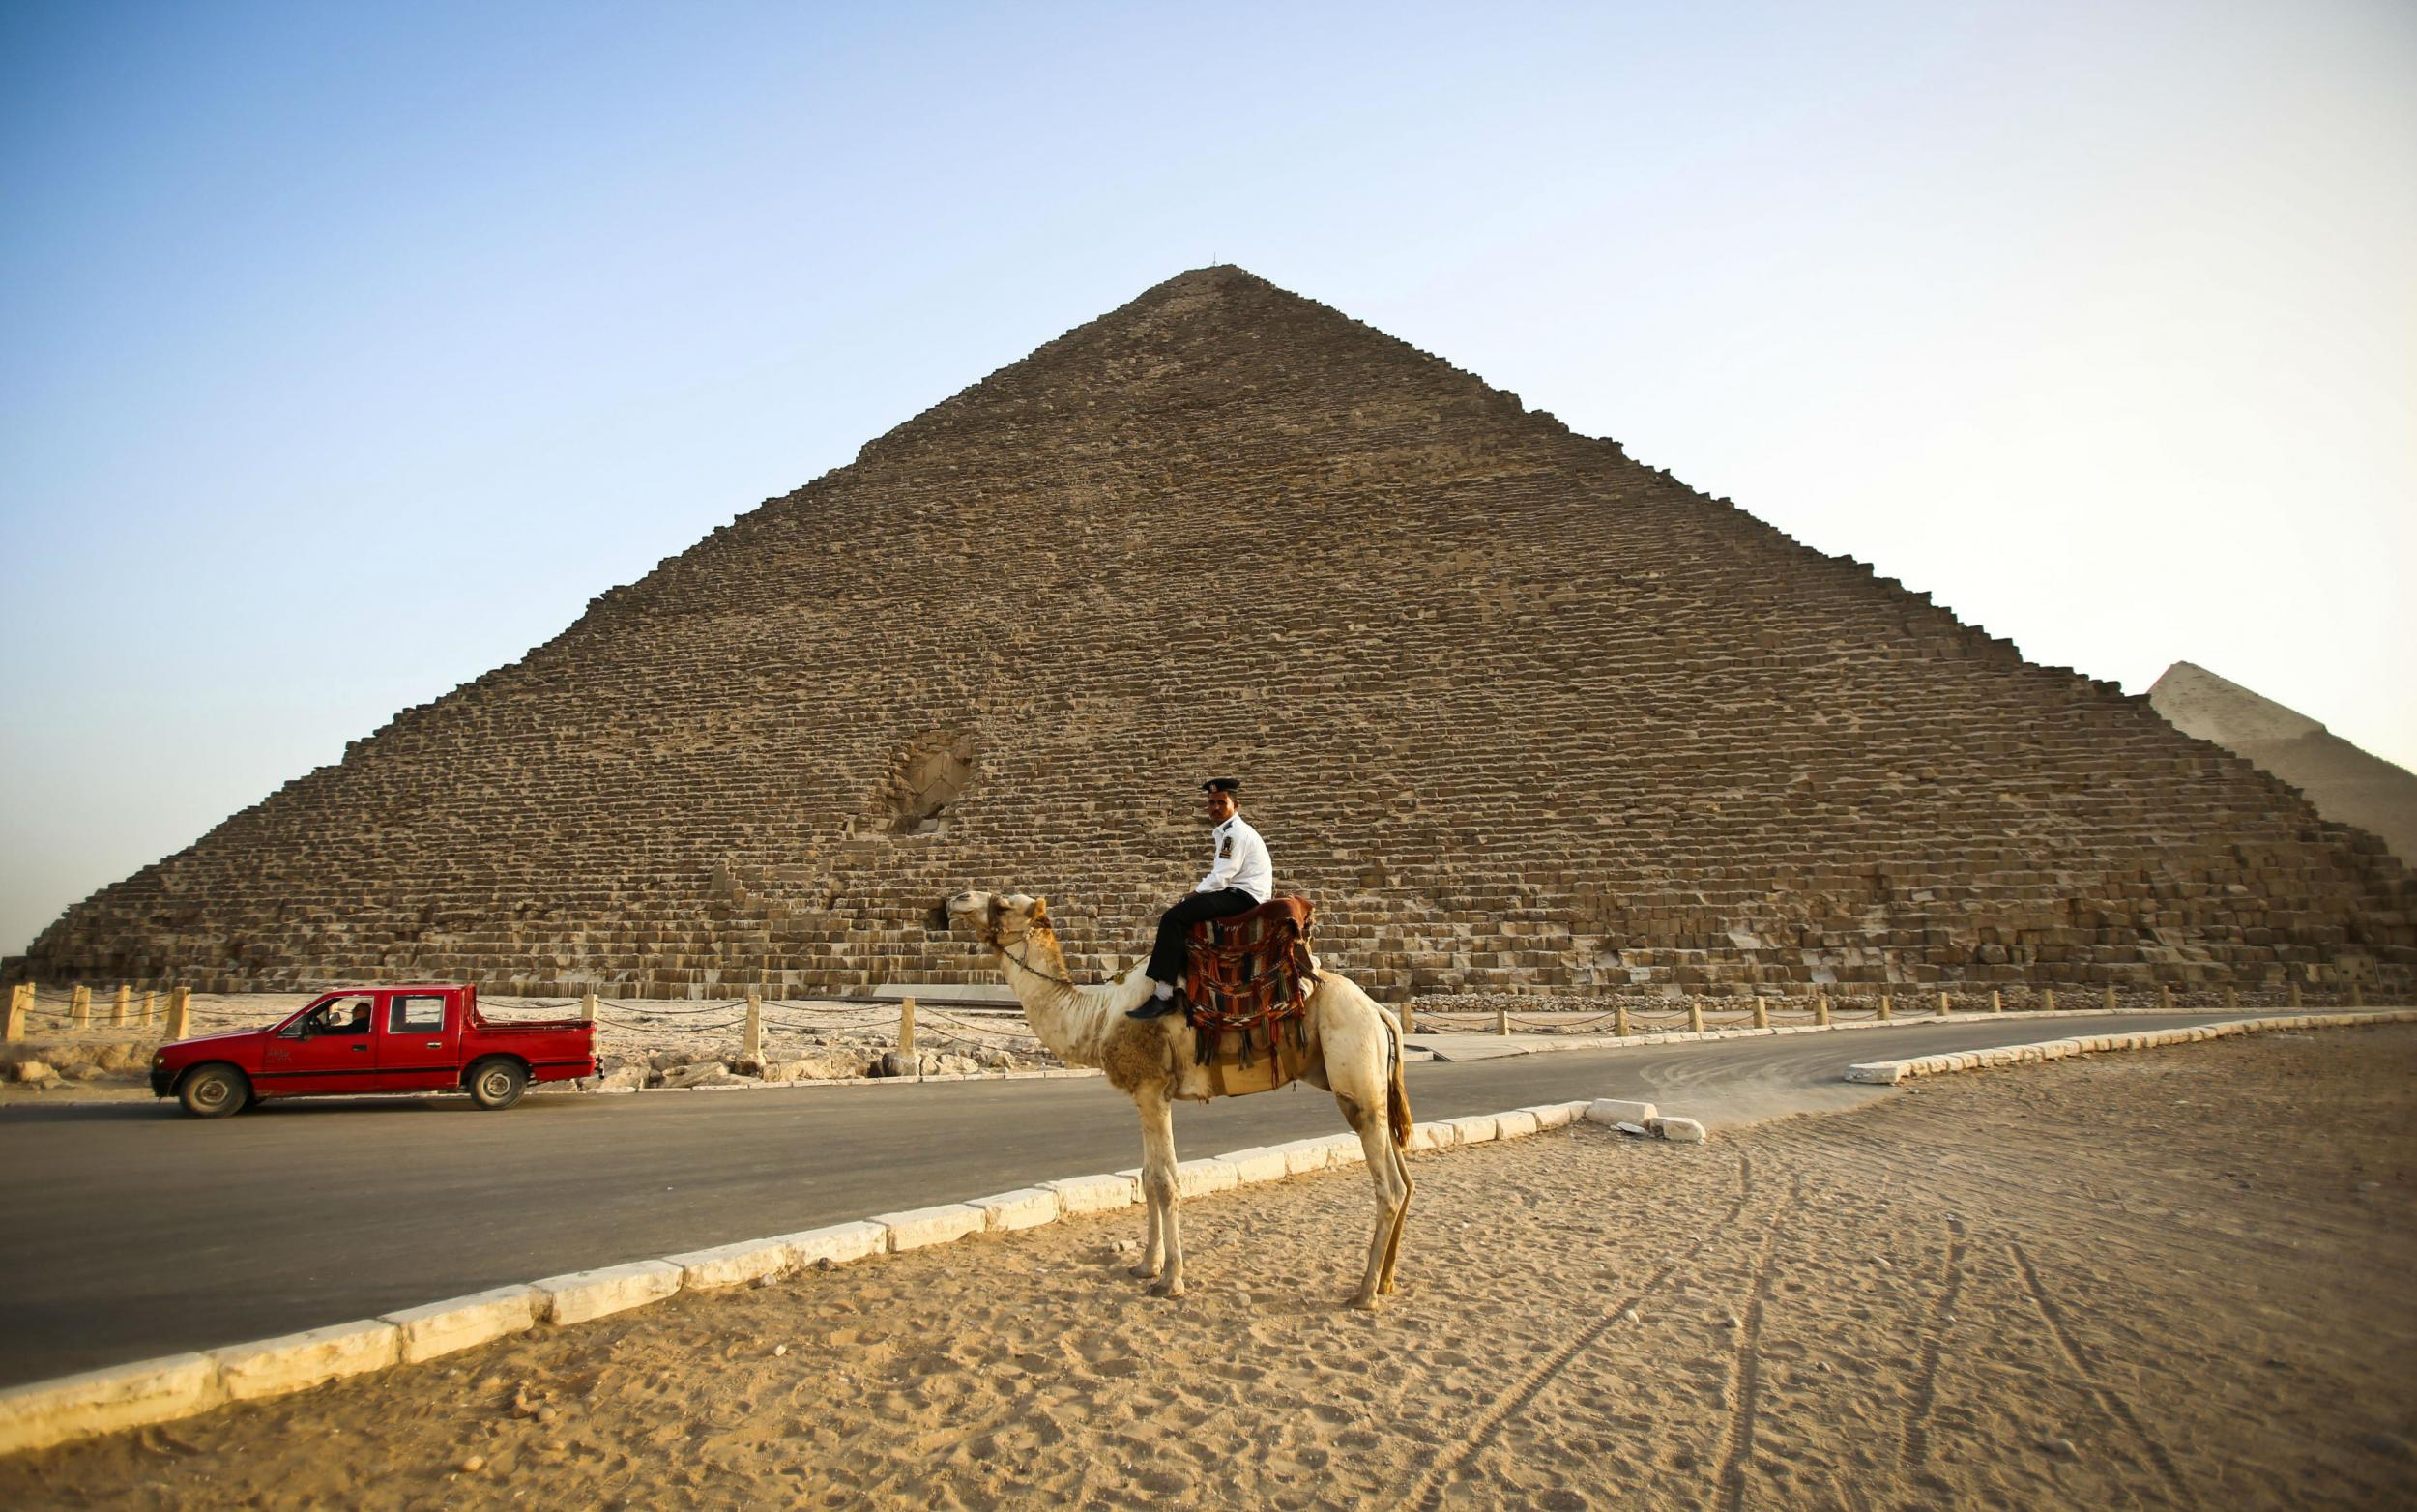 ben carson says pyramids were u0027built by biblical figure joseph to